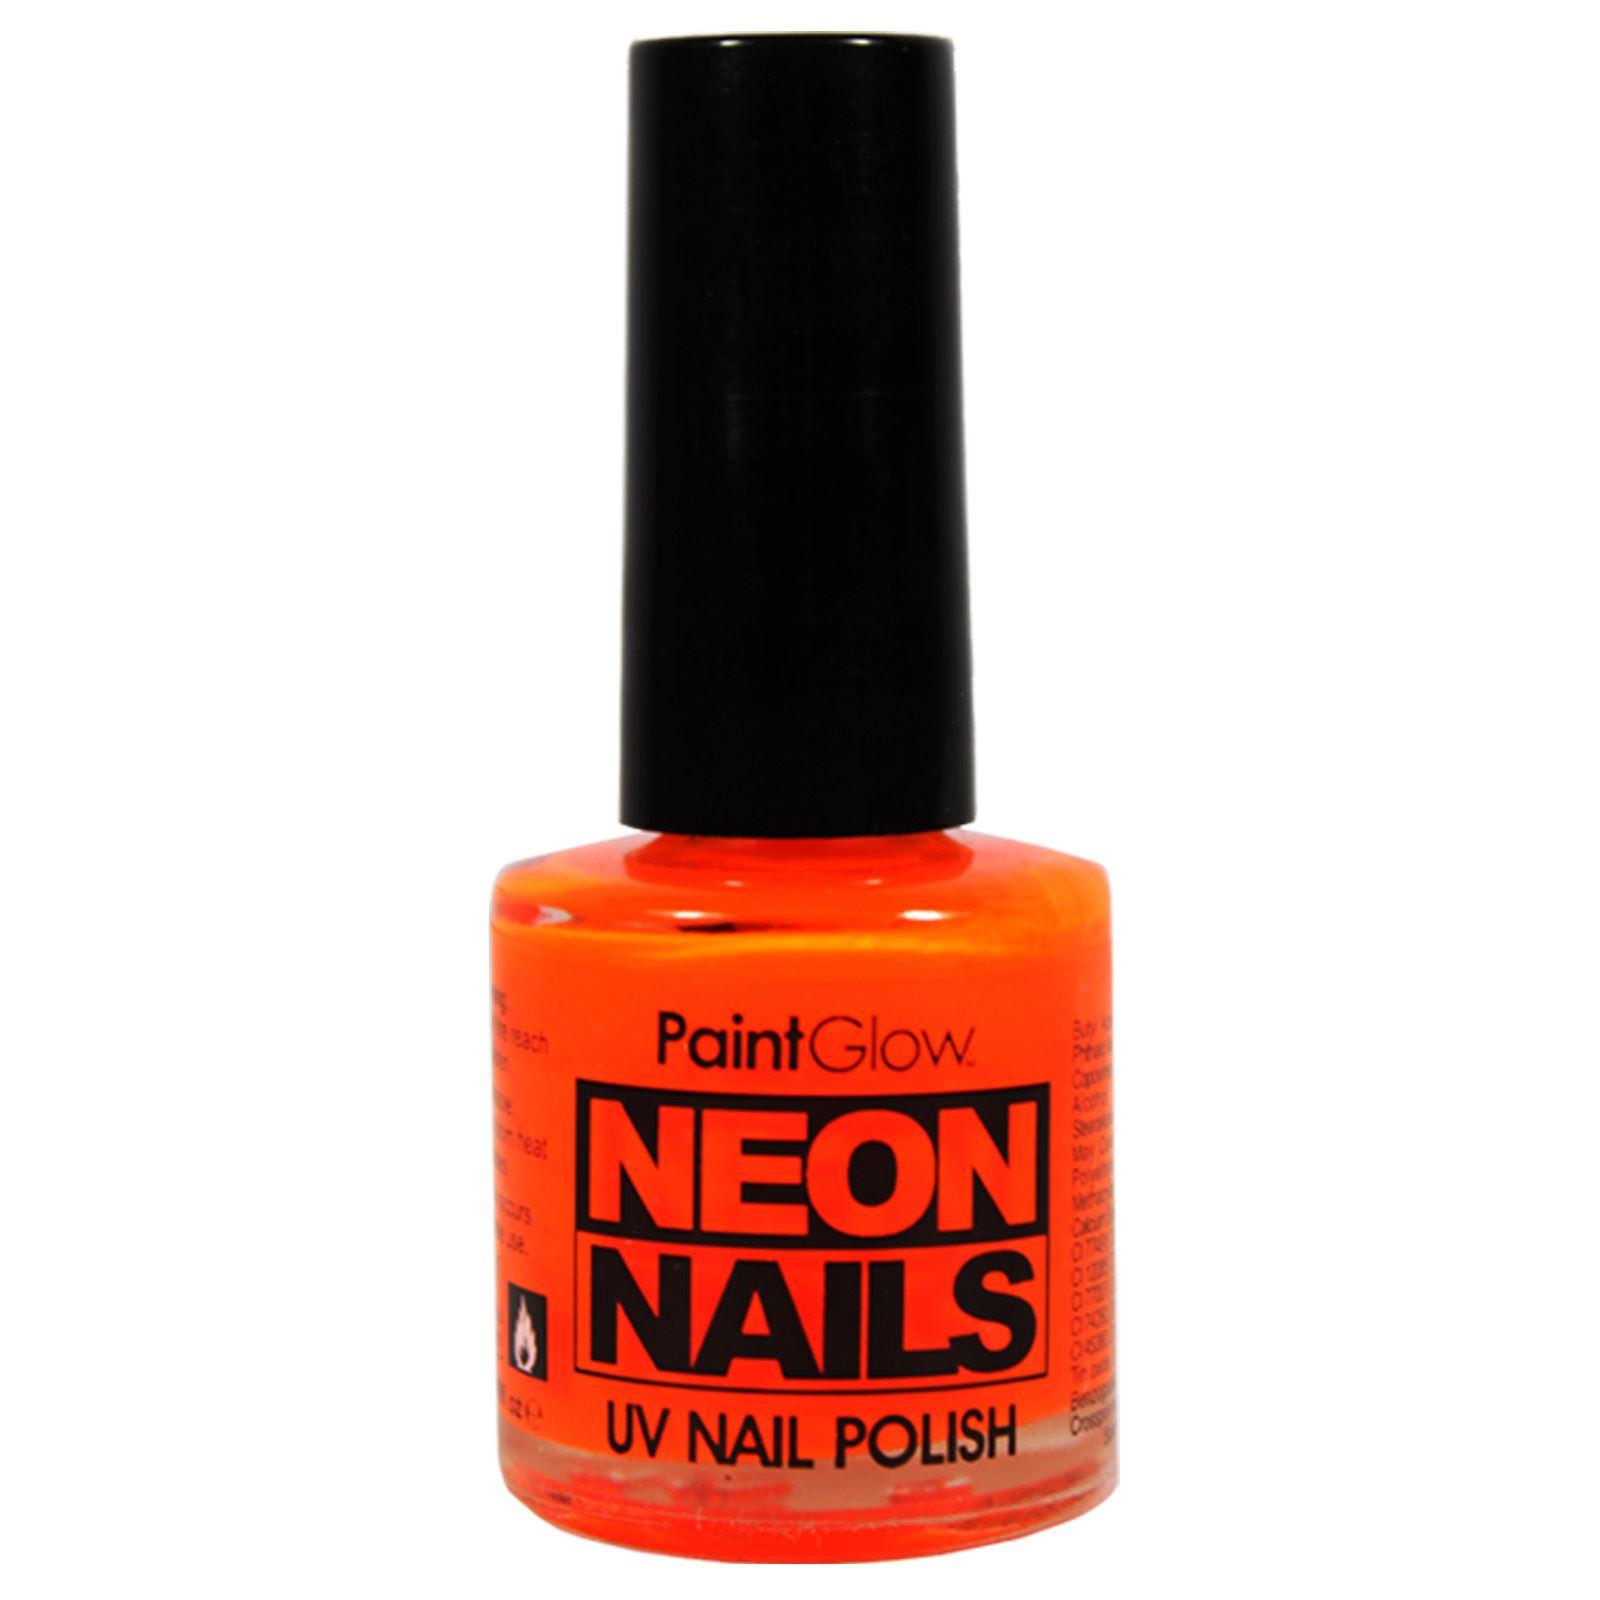 Fluorescent Neon Nail Polish: Paintglow UV Nail Polish Fluorescent Neon Glow Bright Nail